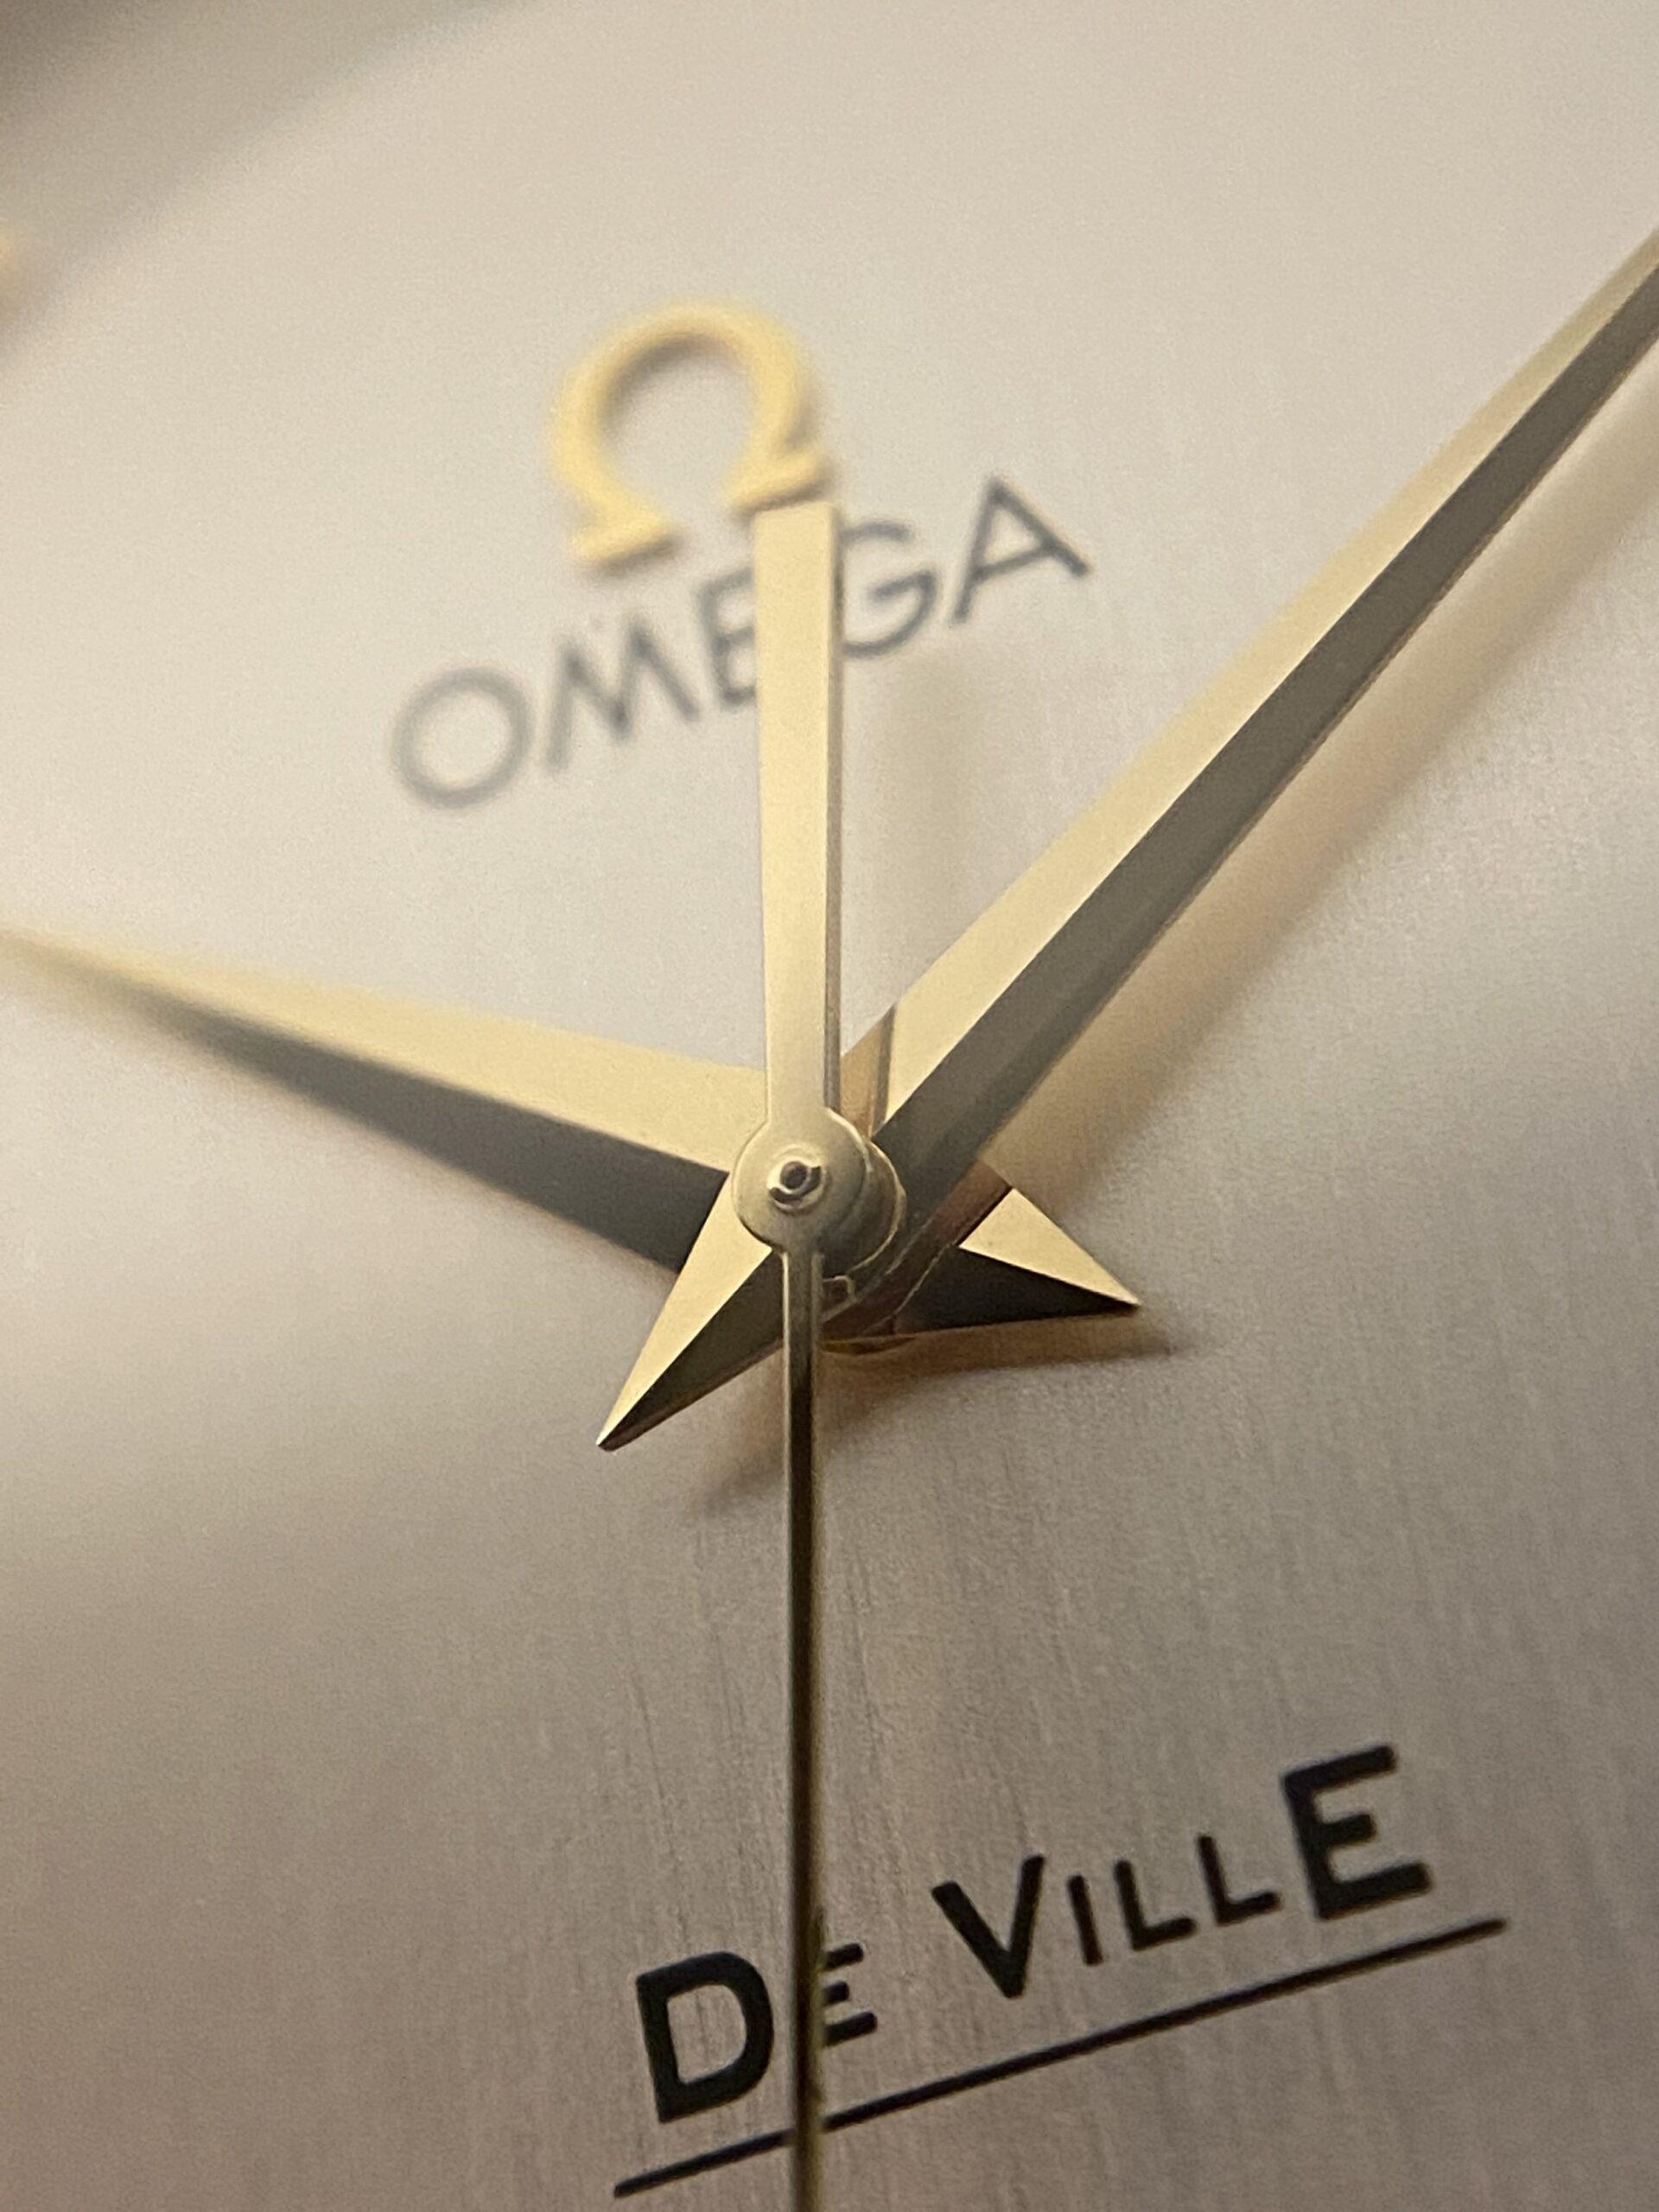 De Ville Prestige 18k Solid Gold watch macro